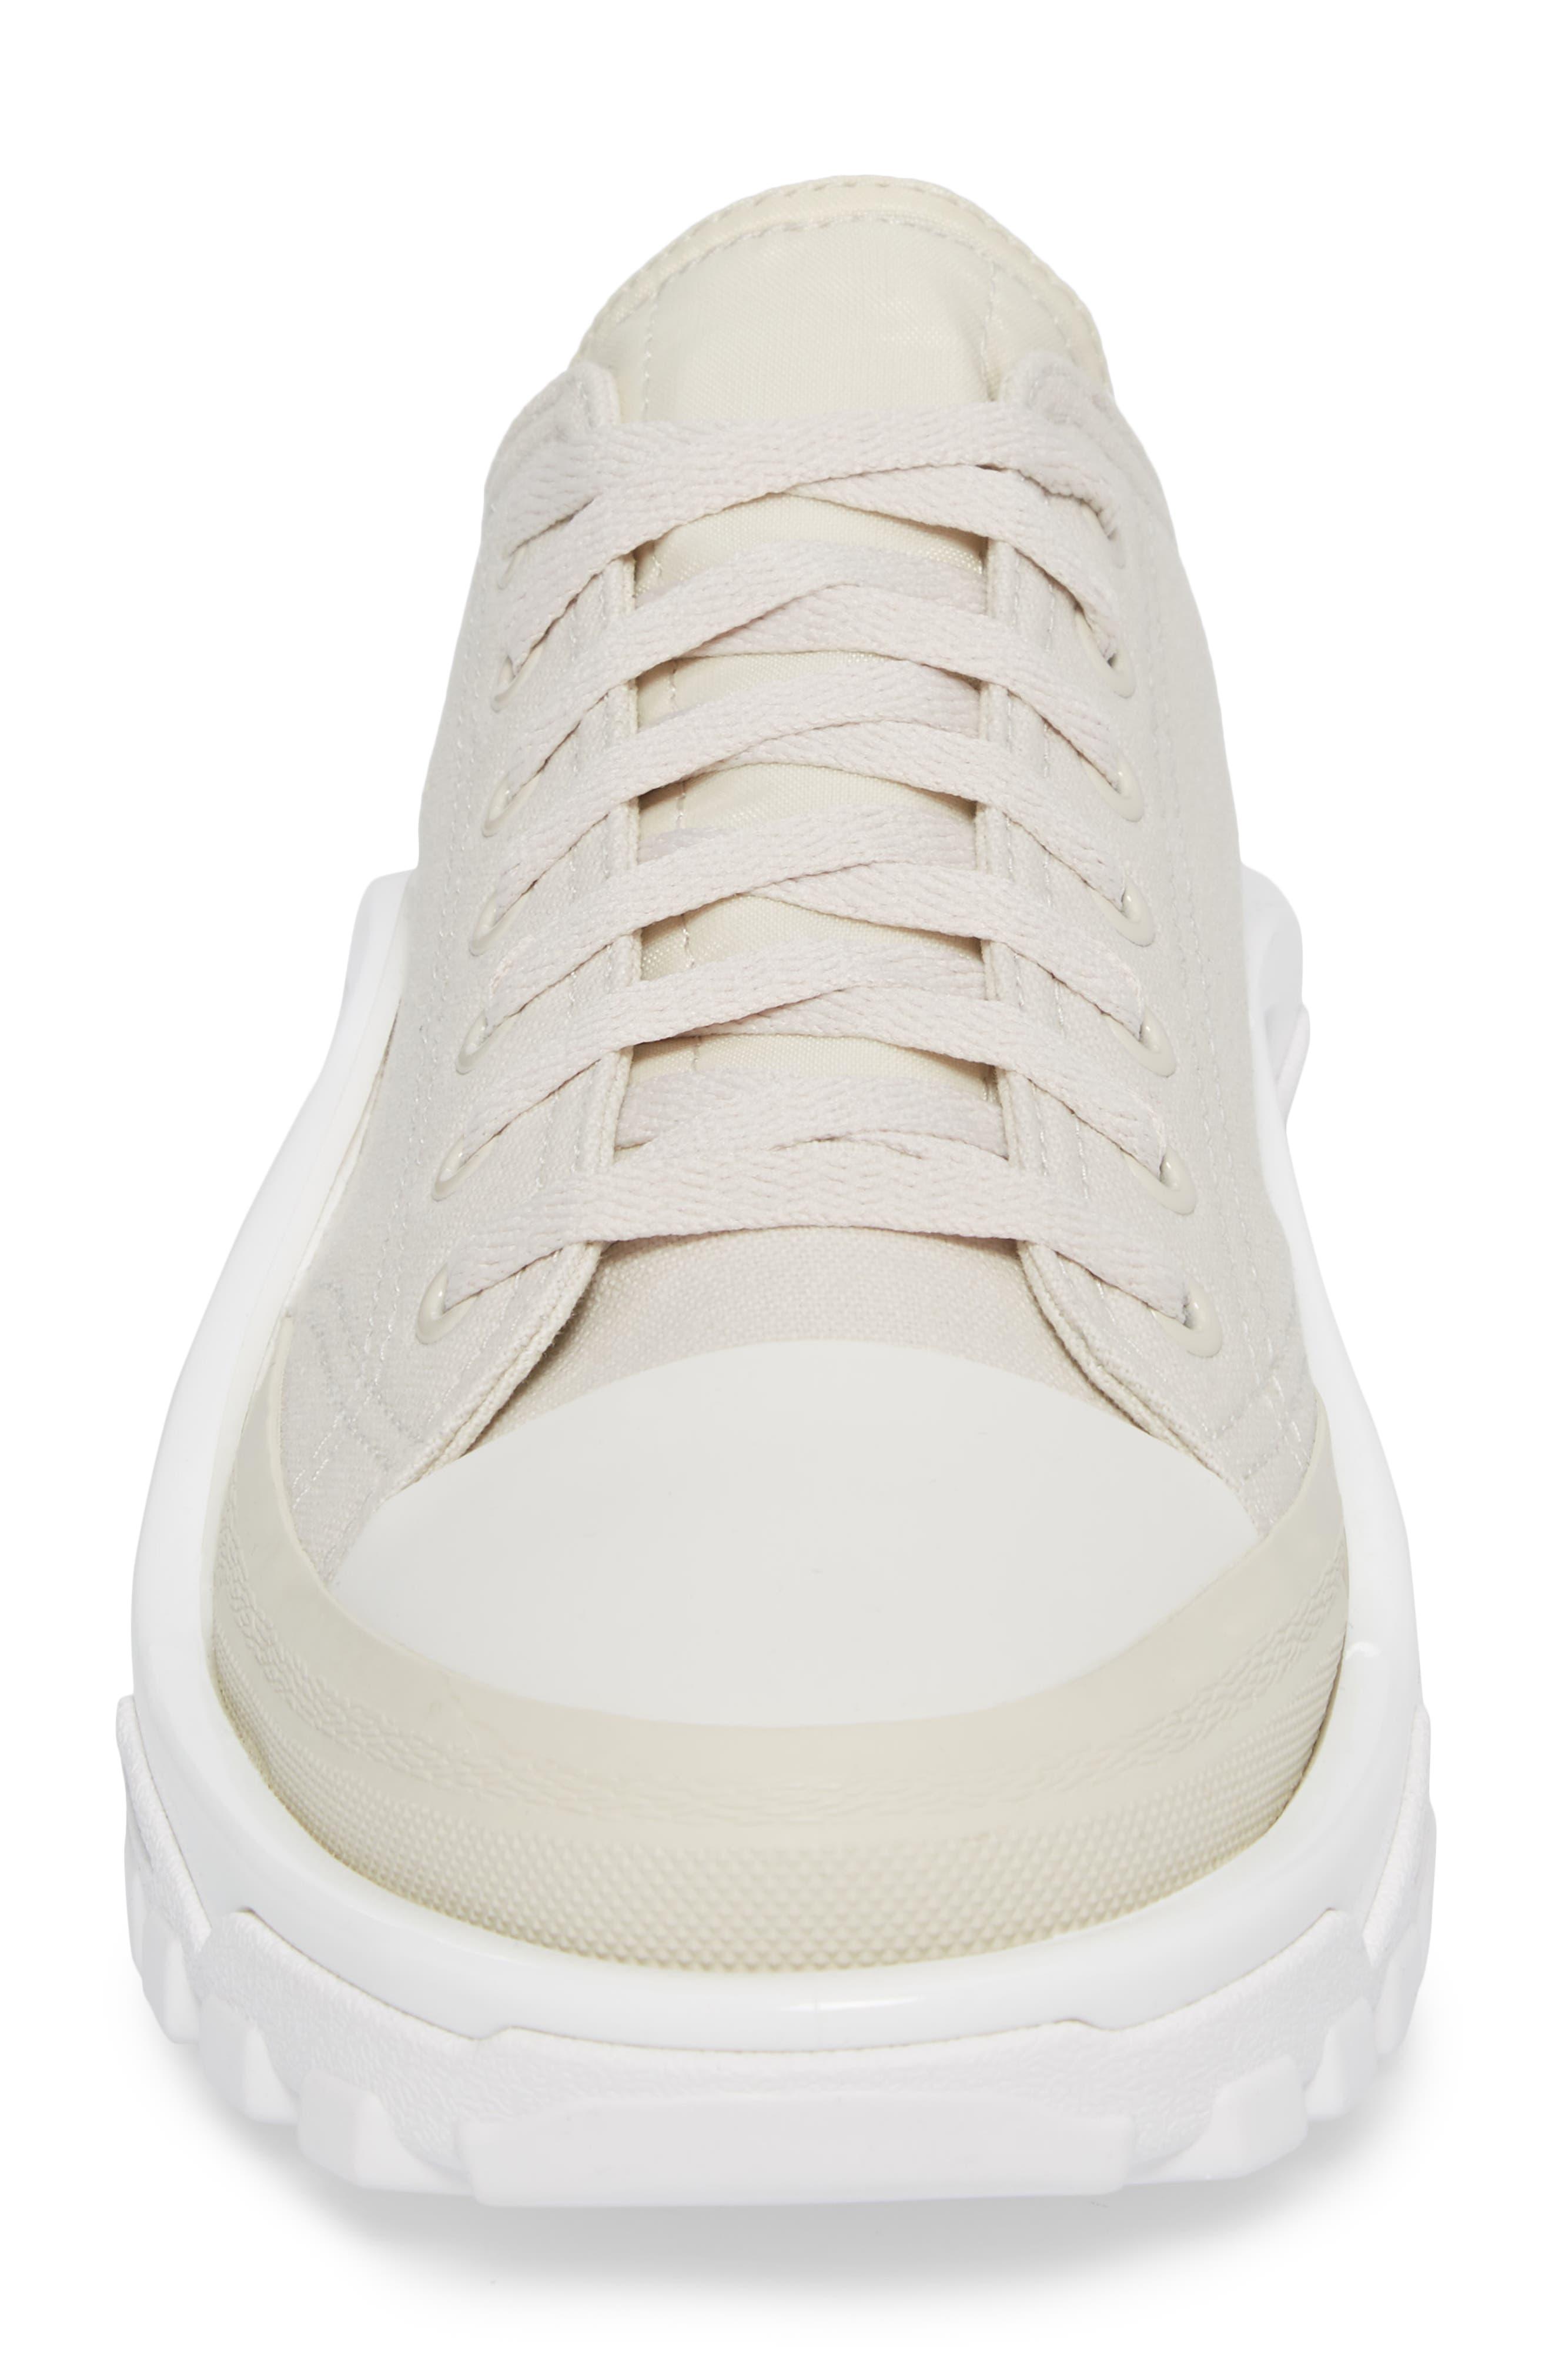 Detroit Low Top Sneaker,                             Alternate thumbnail 4, color,                             Beige/ White